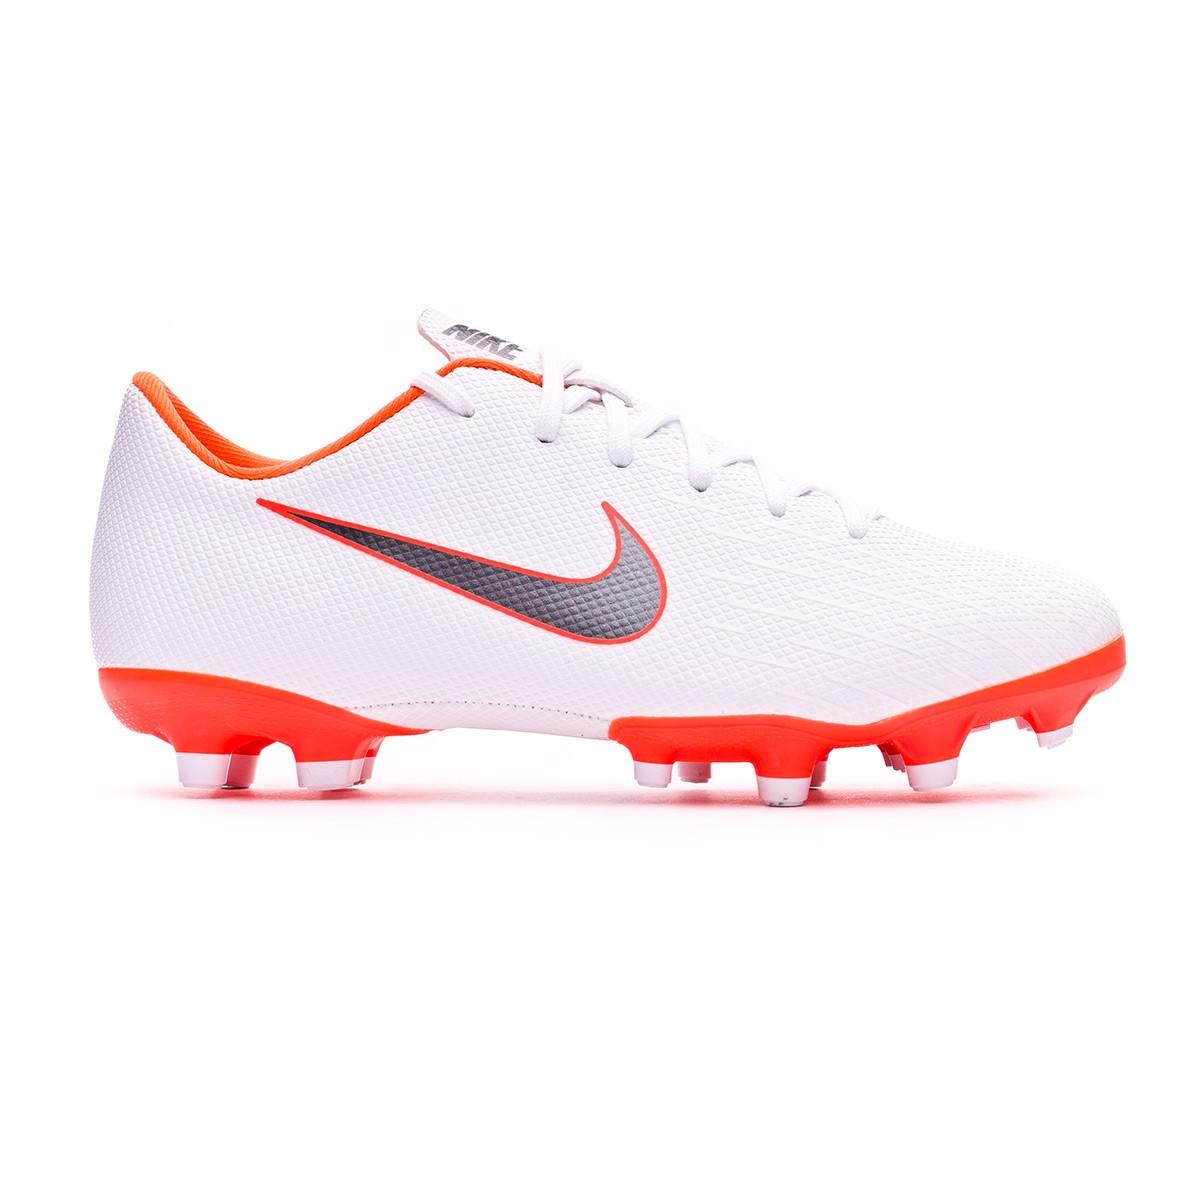 size 40 435de 86880 CATEGORY. Football boots · Nike football boots · Nike Mercurial · Nike  Mercurial Vapor Academy